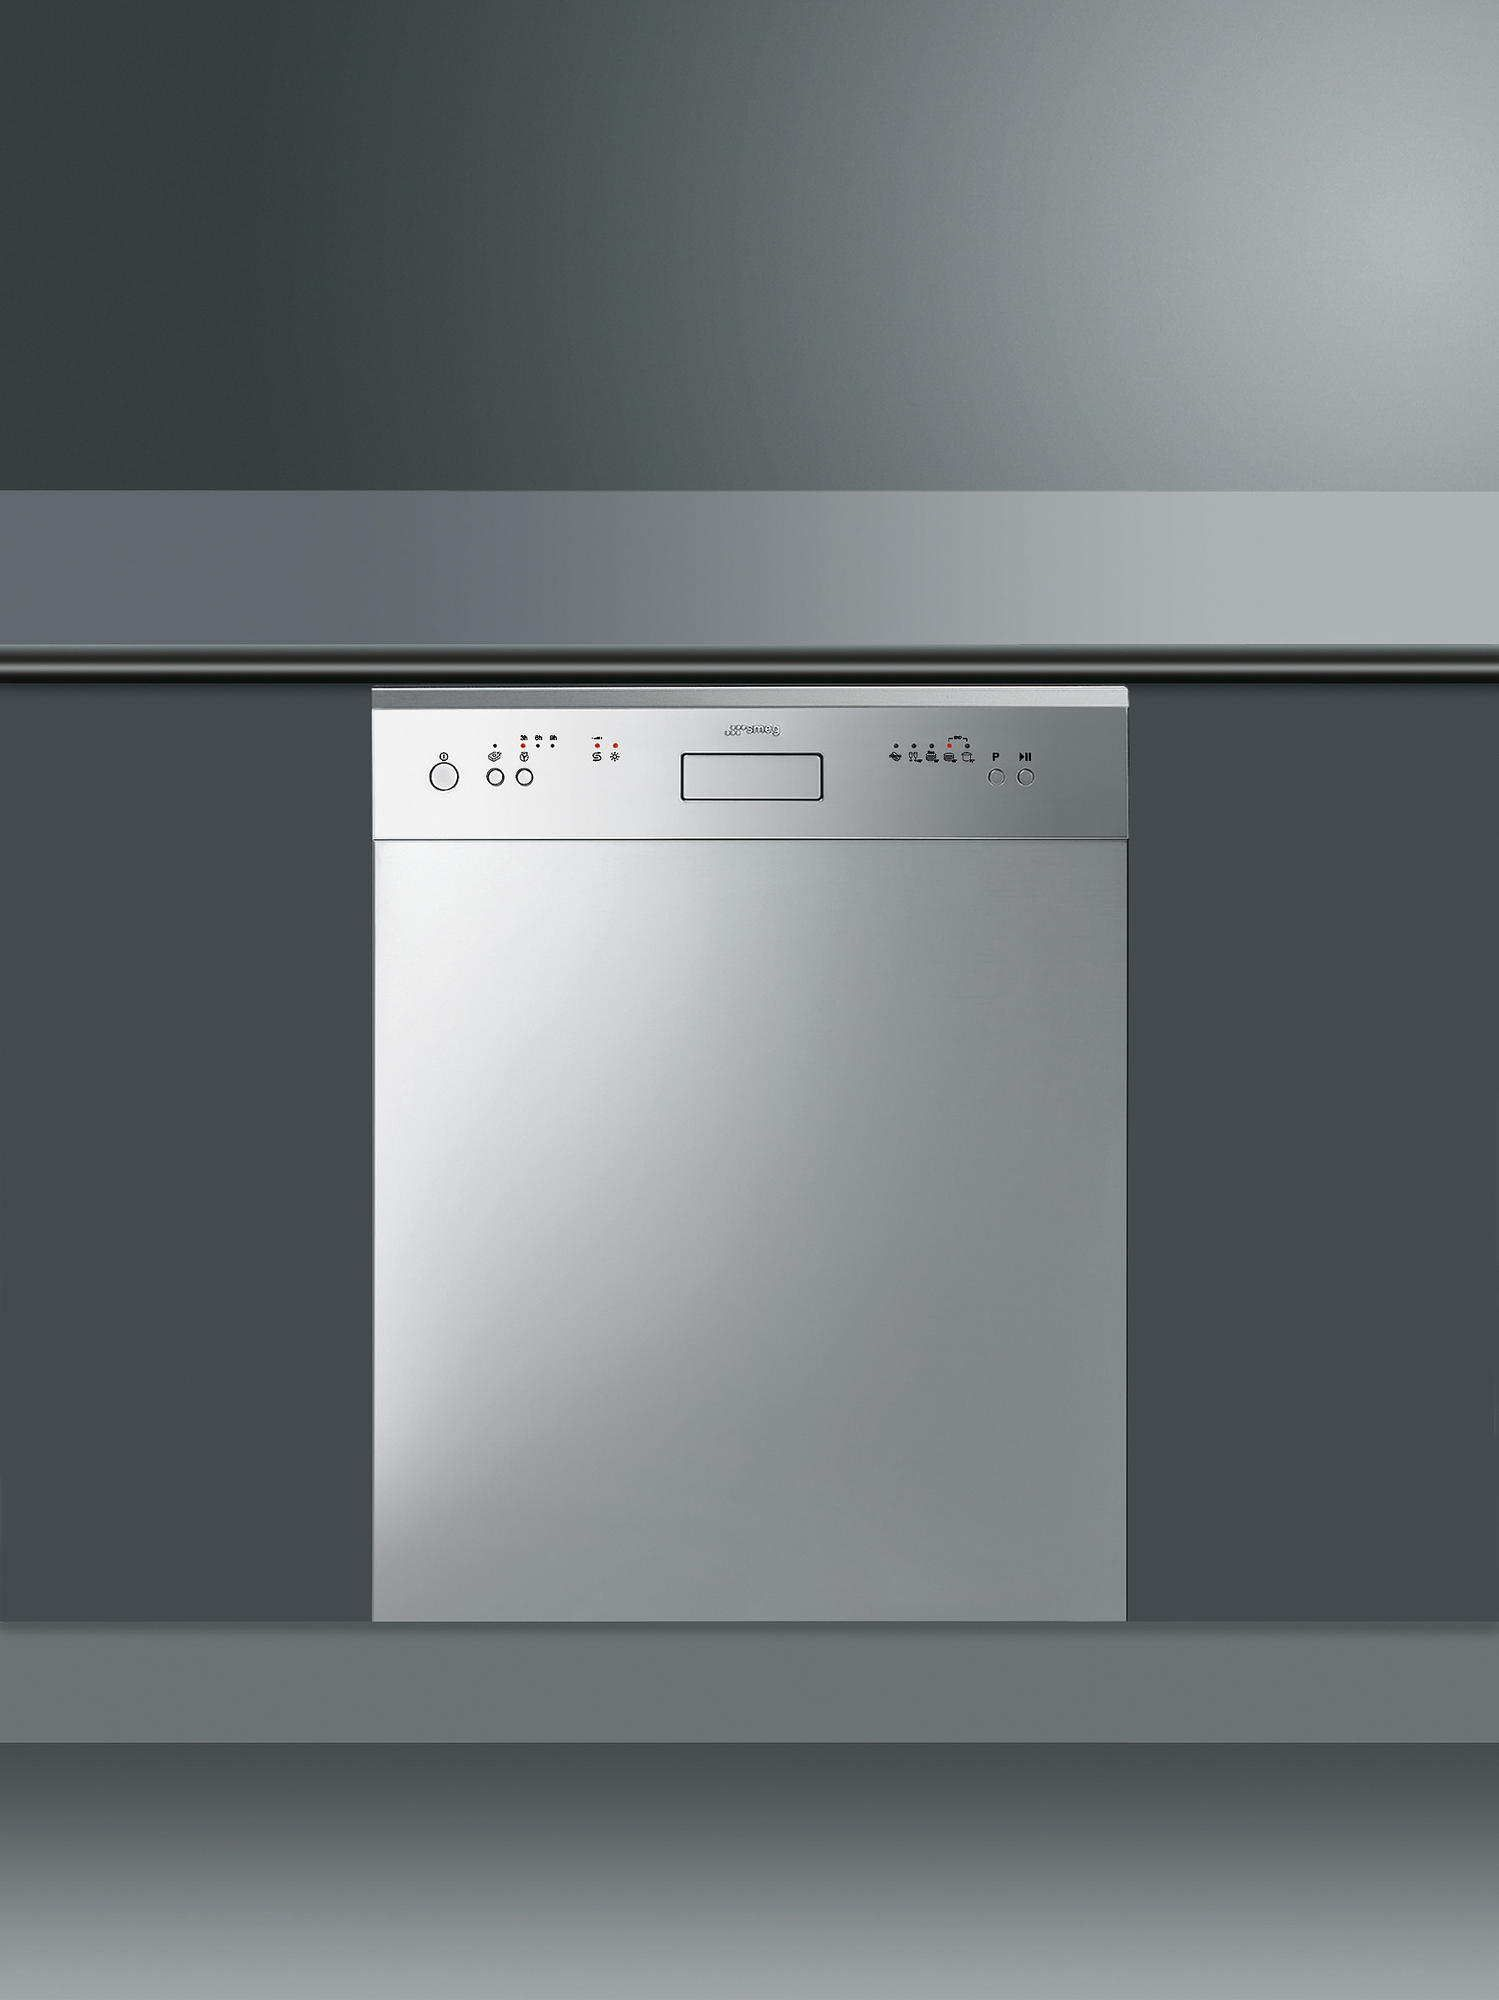 smeg lsp6448x2 geschirrsp ler unterbau edelstahl g nstig online kaufen. Black Bedroom Furniture Sets. Home Design Ideas